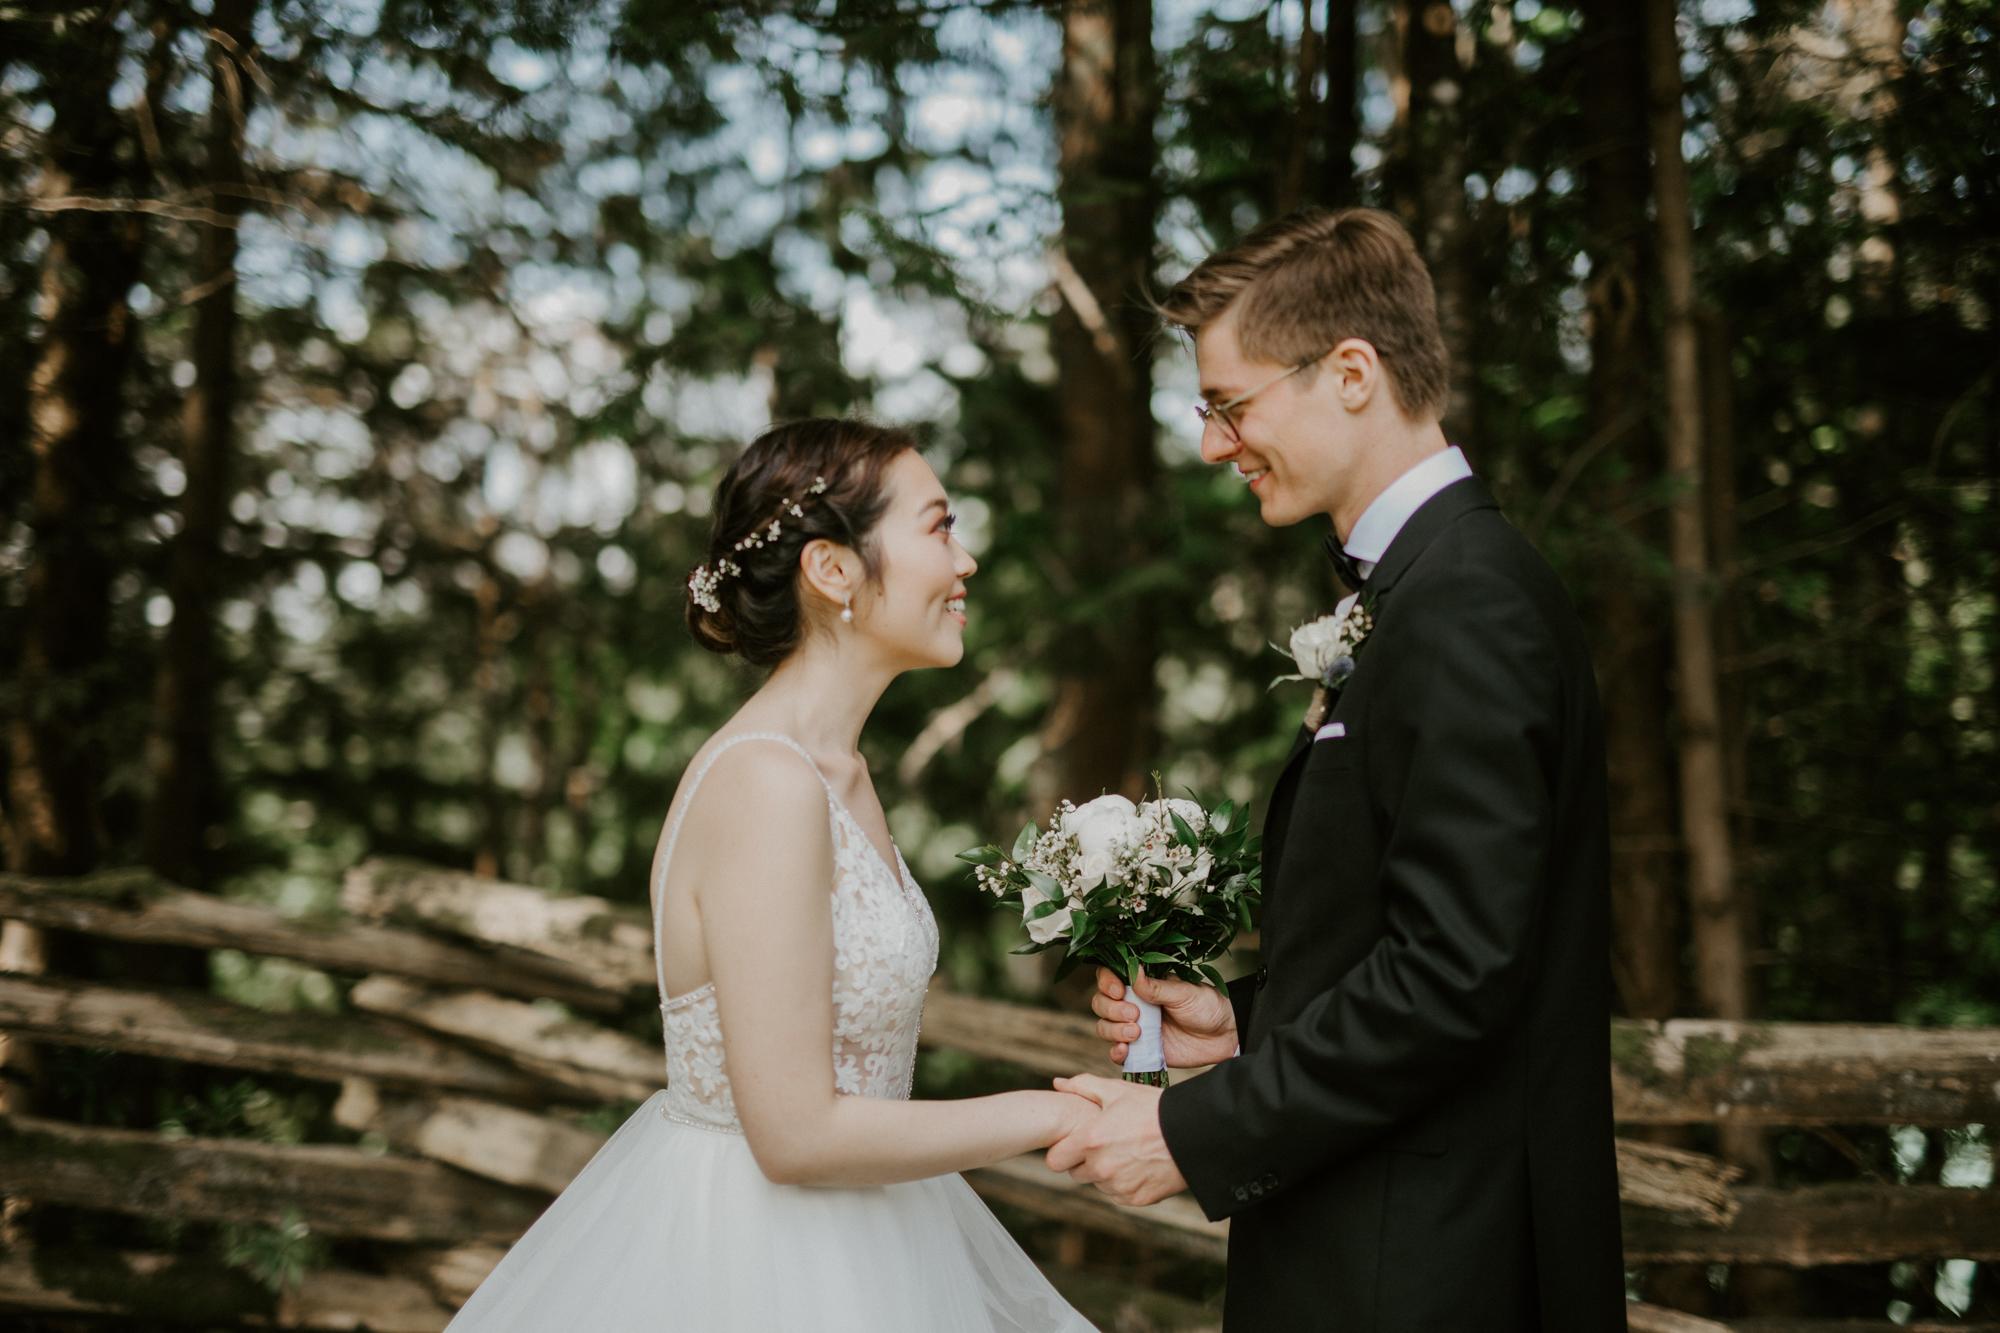 Yelim& Sorin- Wedding Day- HL-SD-55.JPG